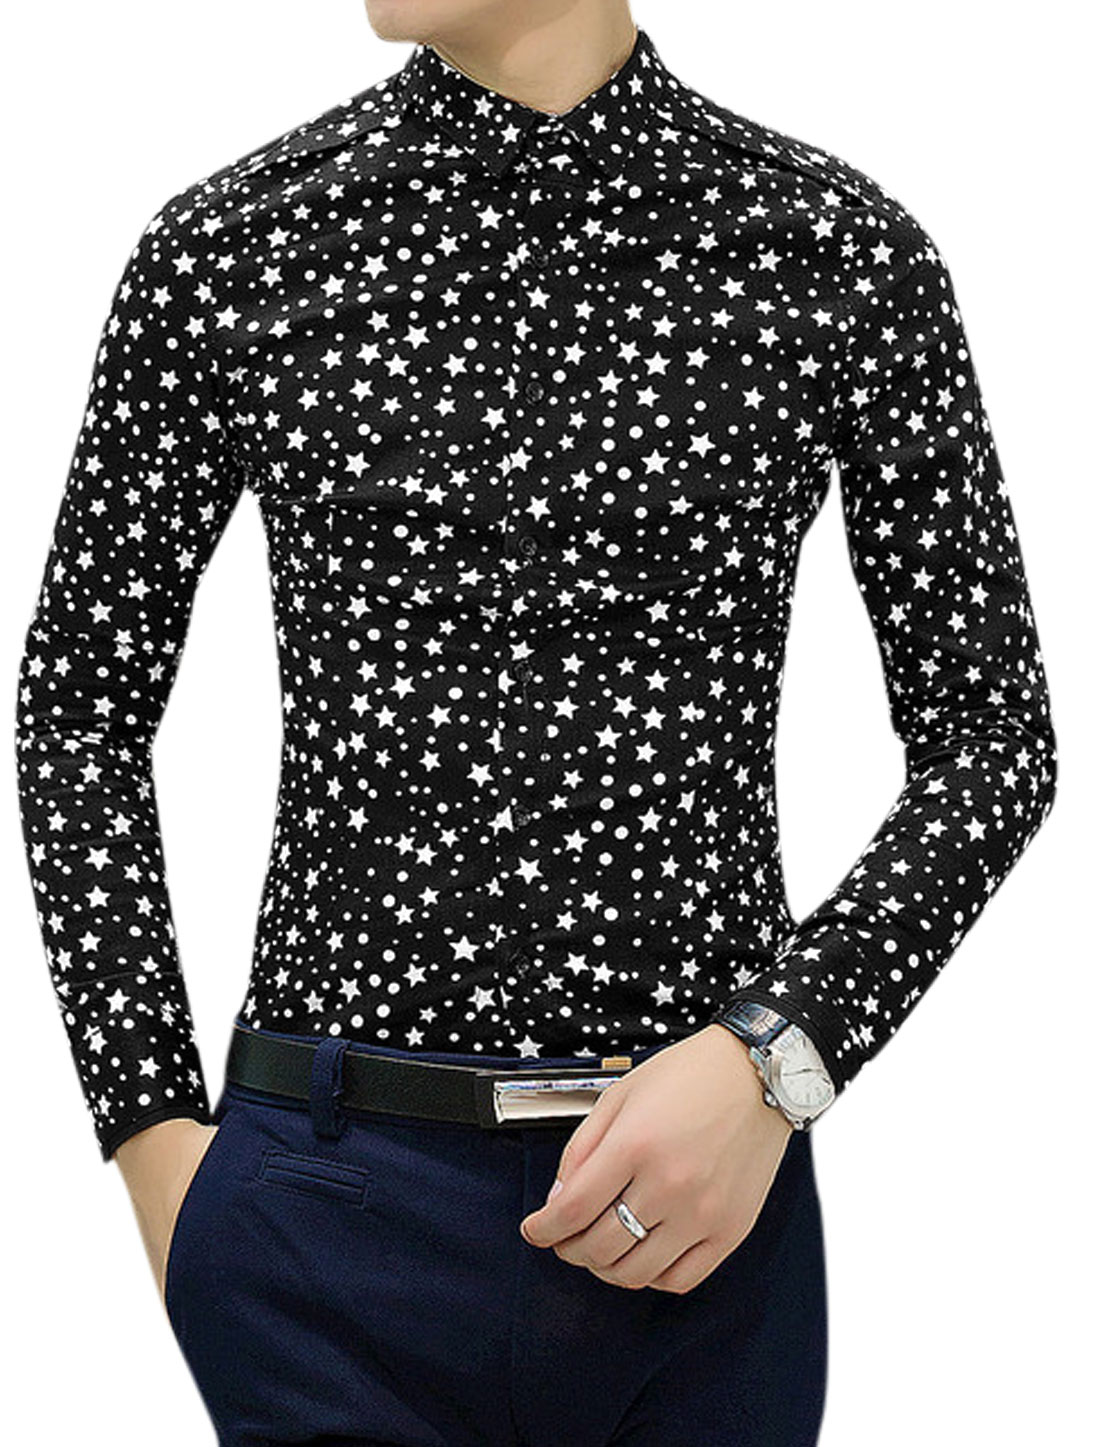 Stars Pattern Point Collar Button Cuffs Black Shirt for Men S